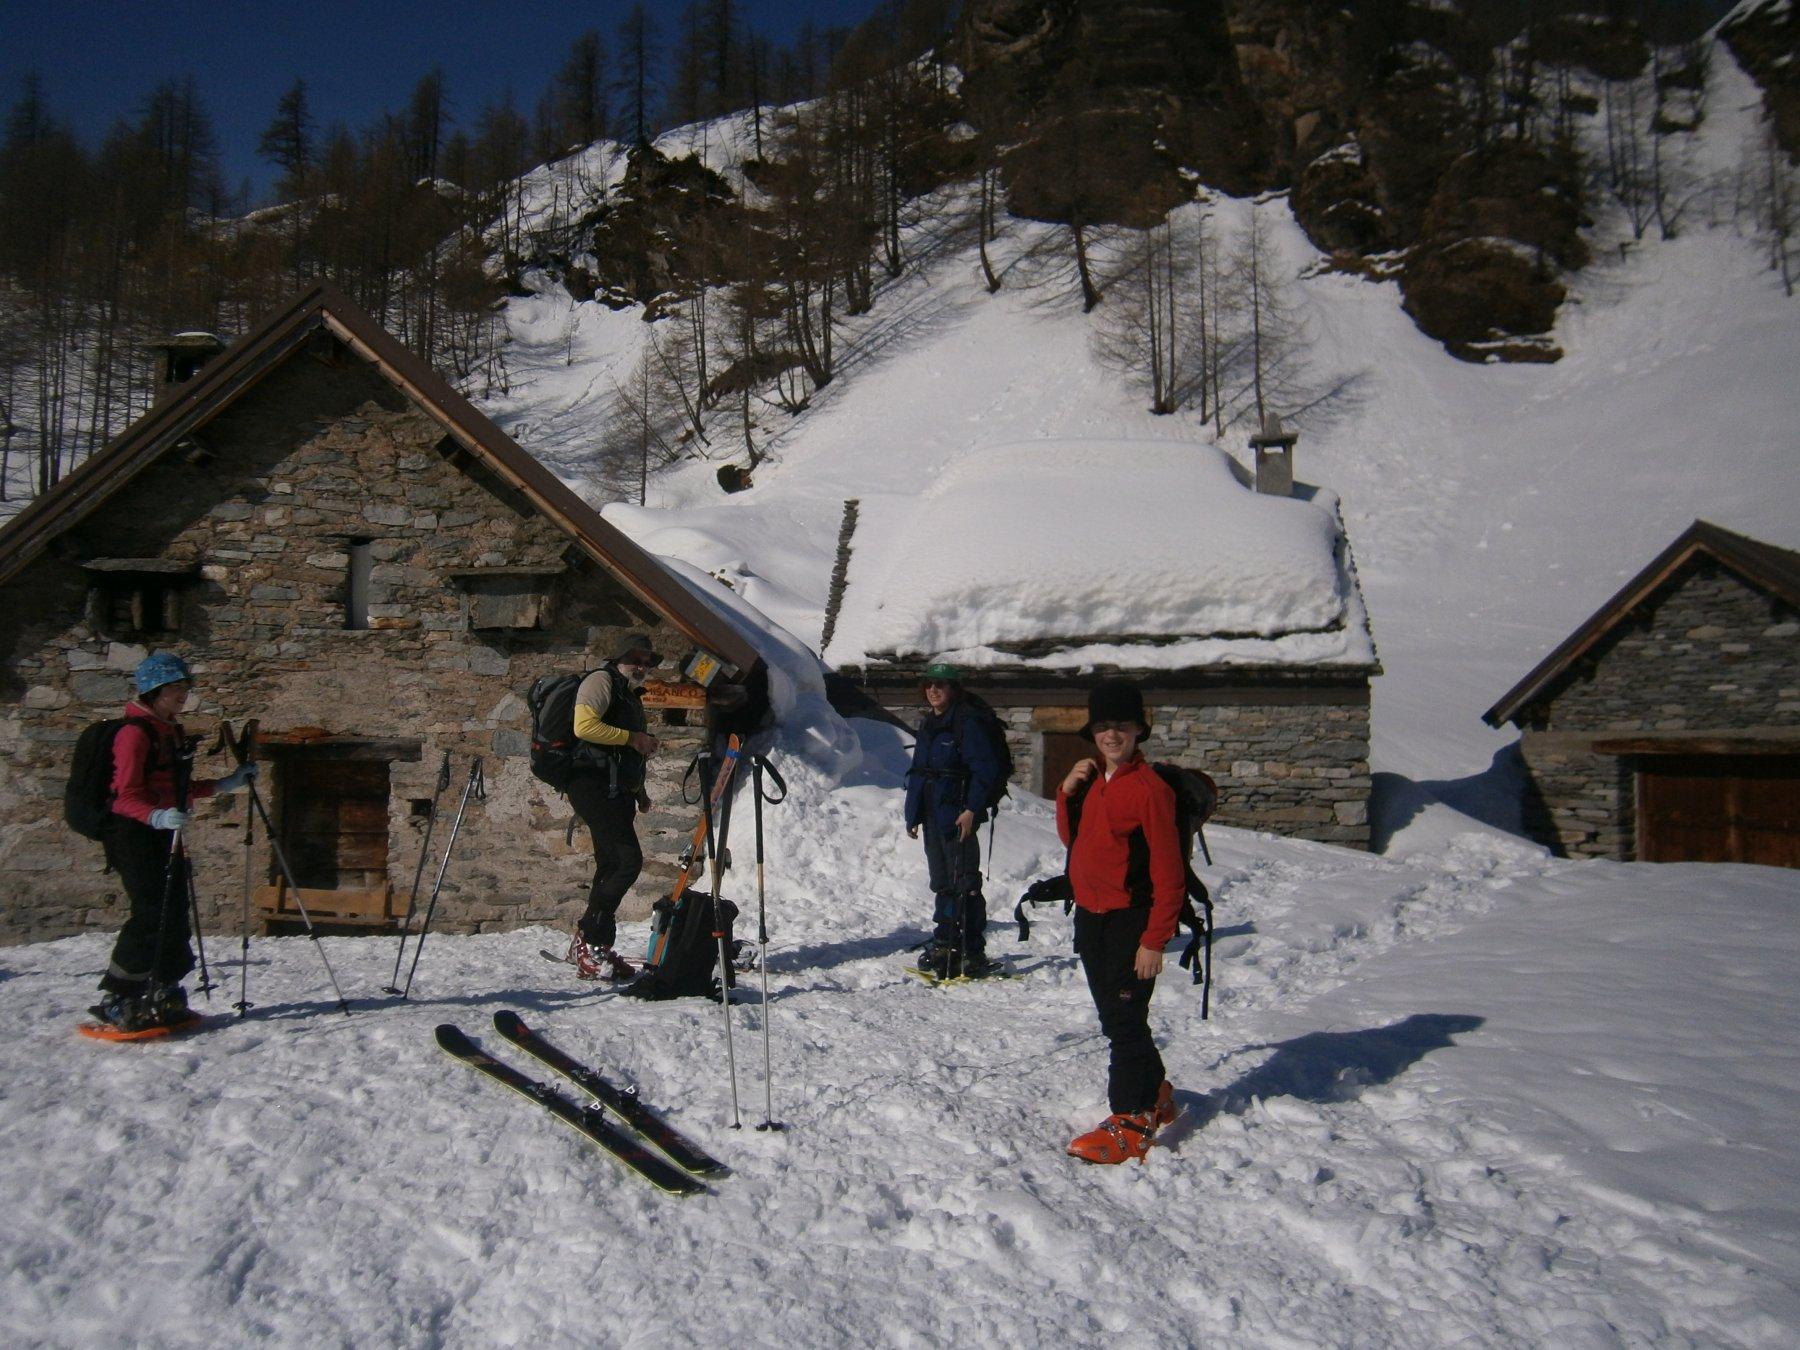 Sosta all'alpe Misanco - 1.900 m